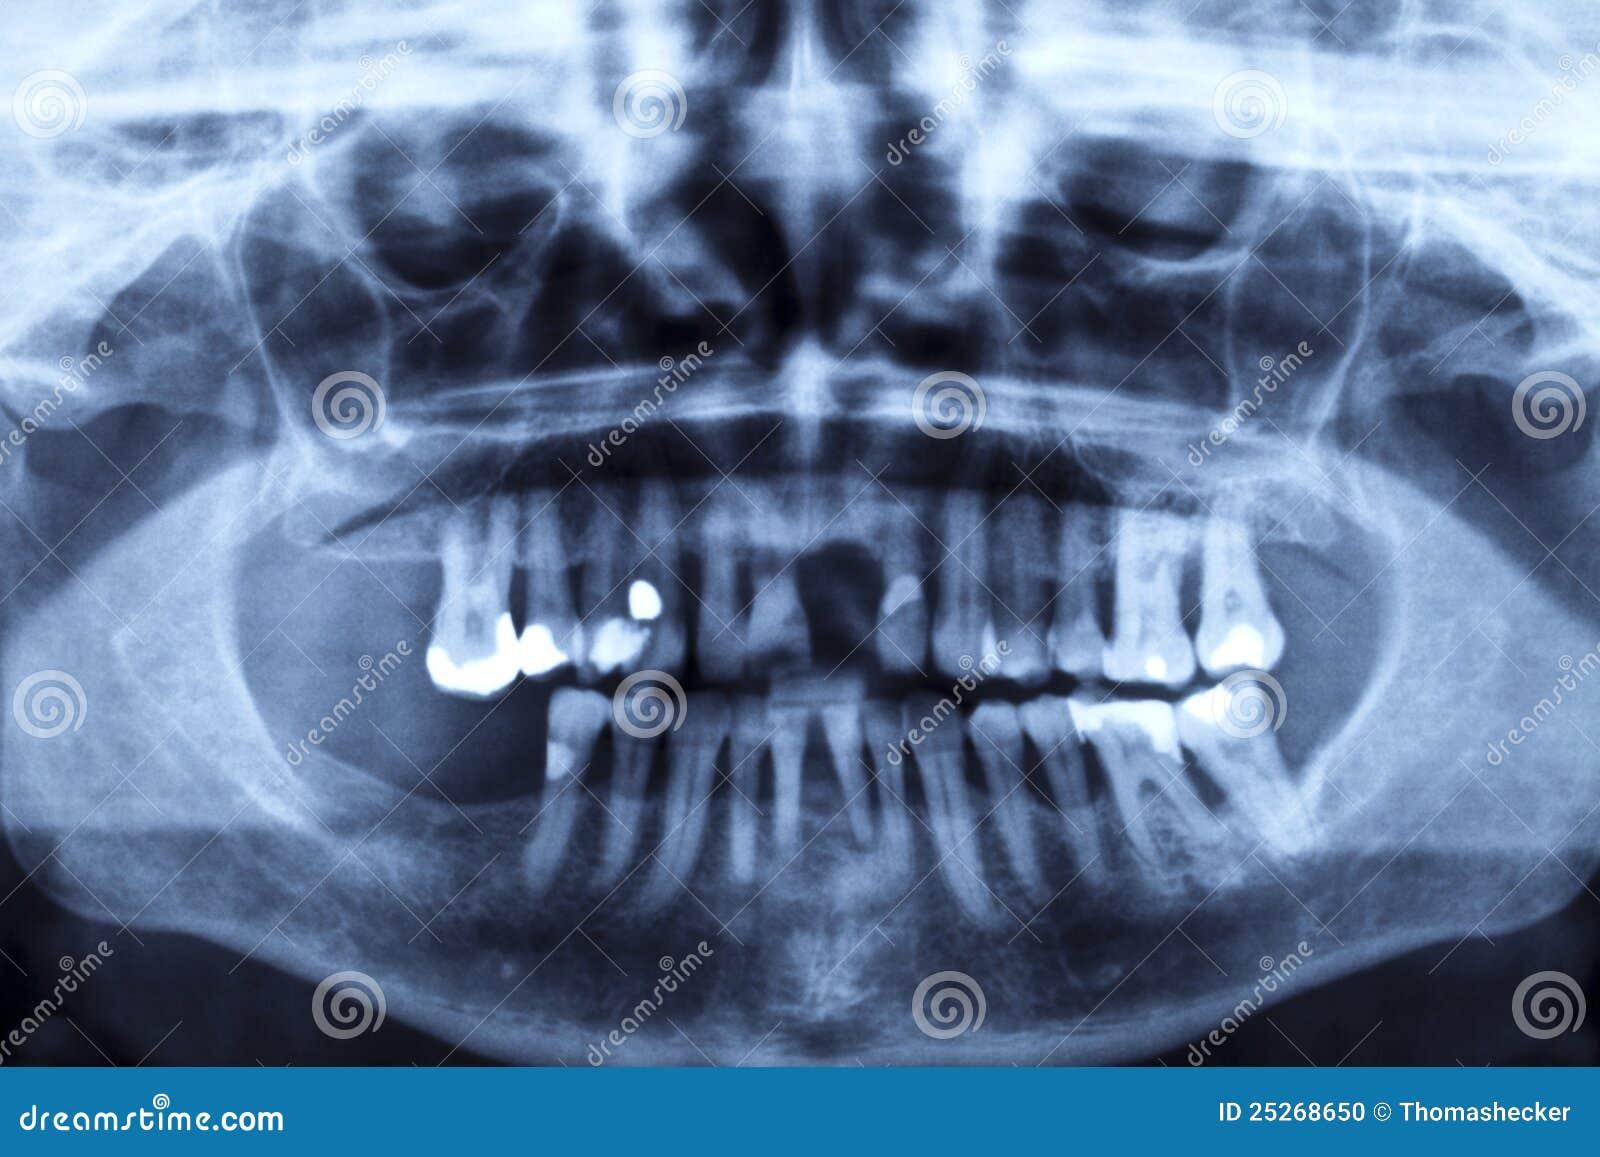 Panorama X-ray Image Of A Human Jaw Stock Photo - Image of anatomy ...